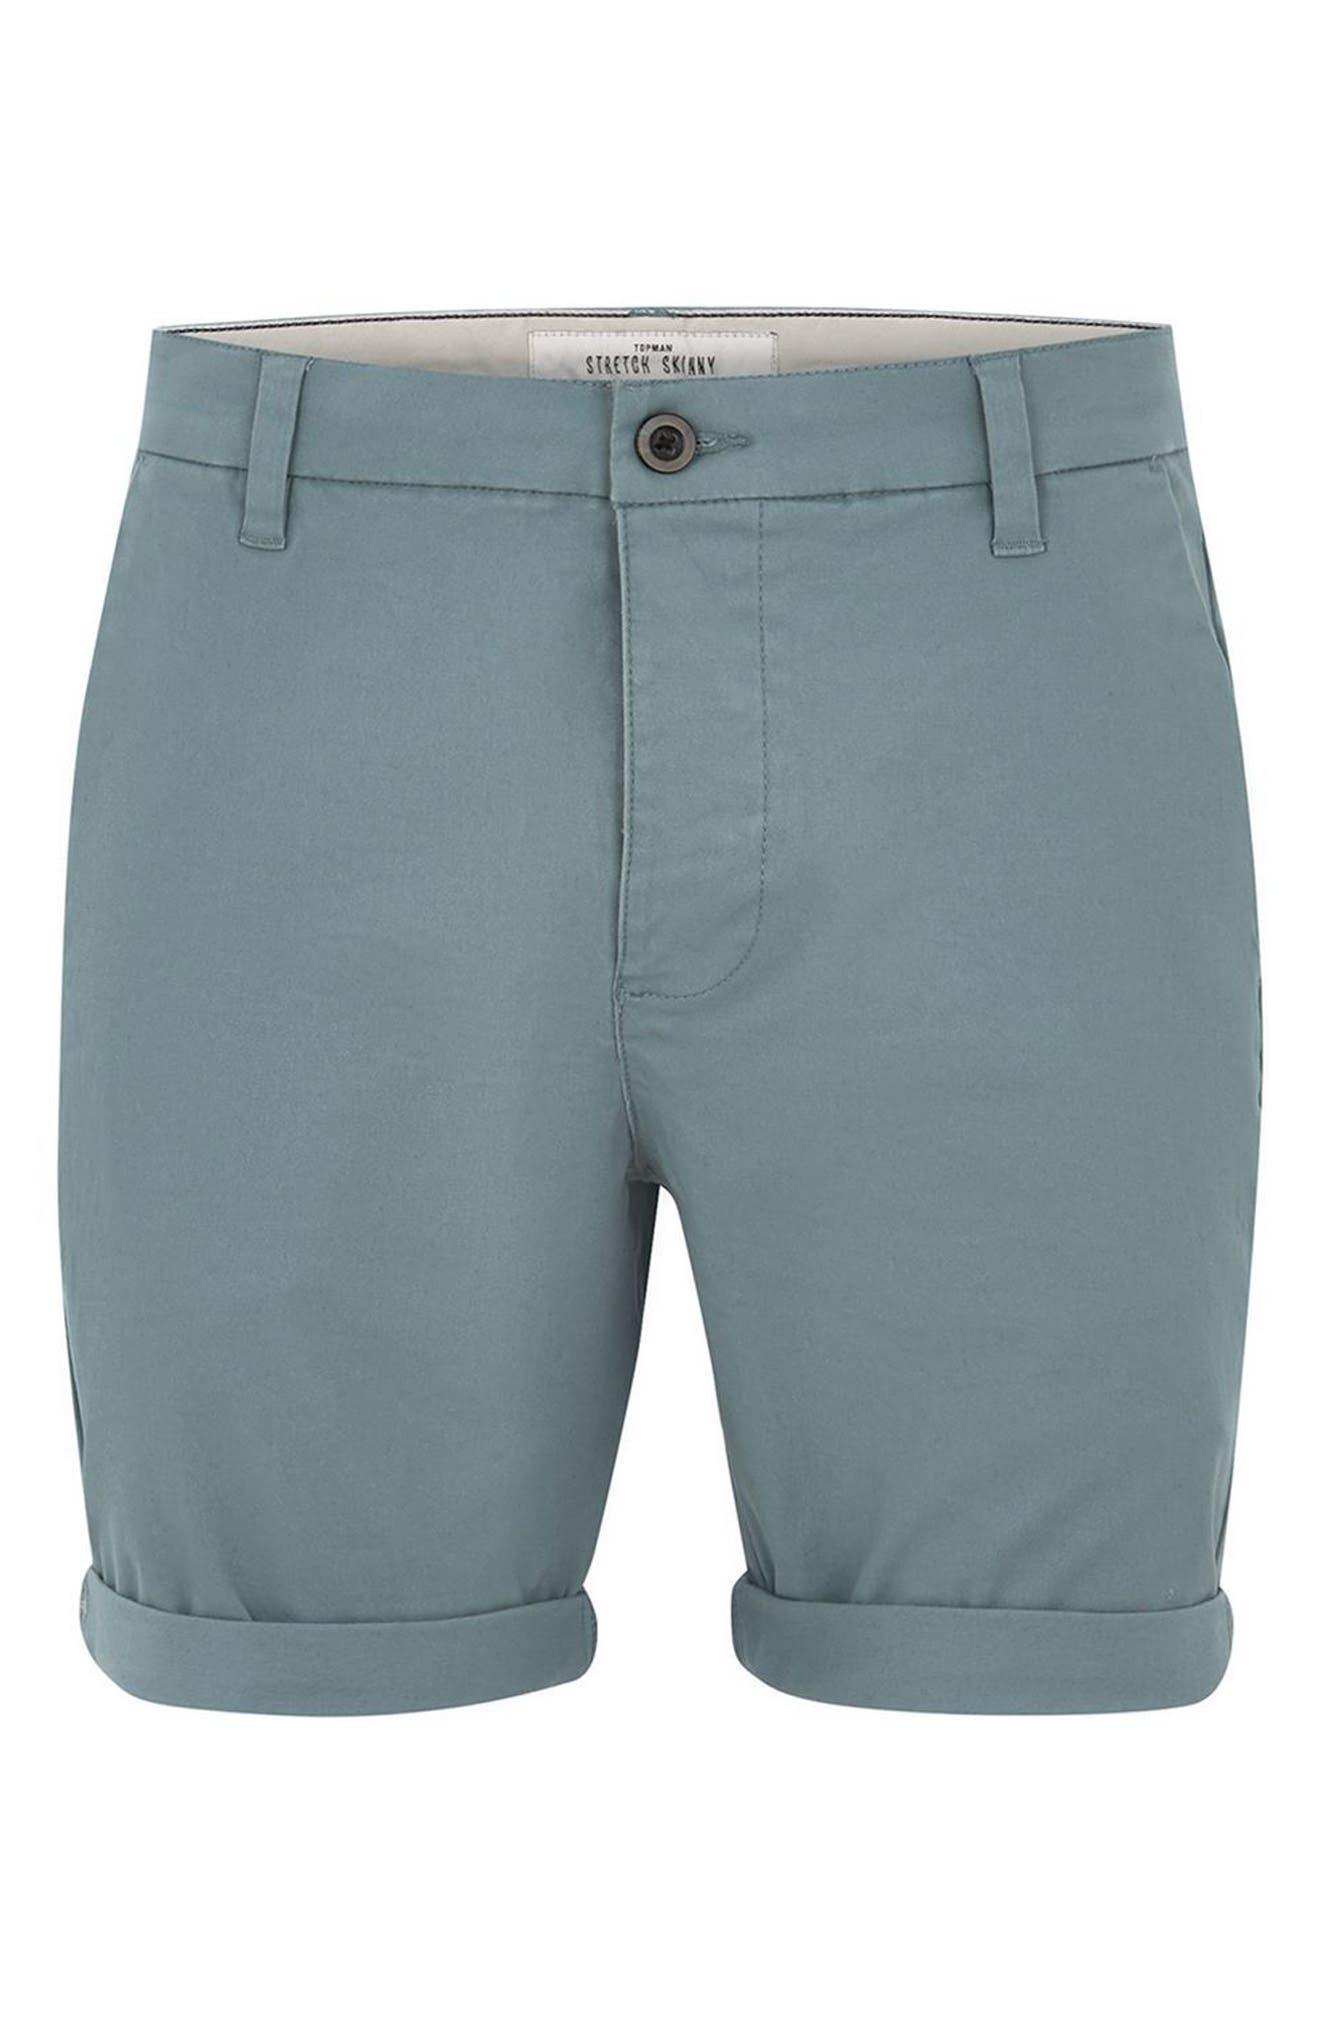 Skinny Fit Chino Shorts,                             Alternate thumbnail 4, color,                             Dark Blue